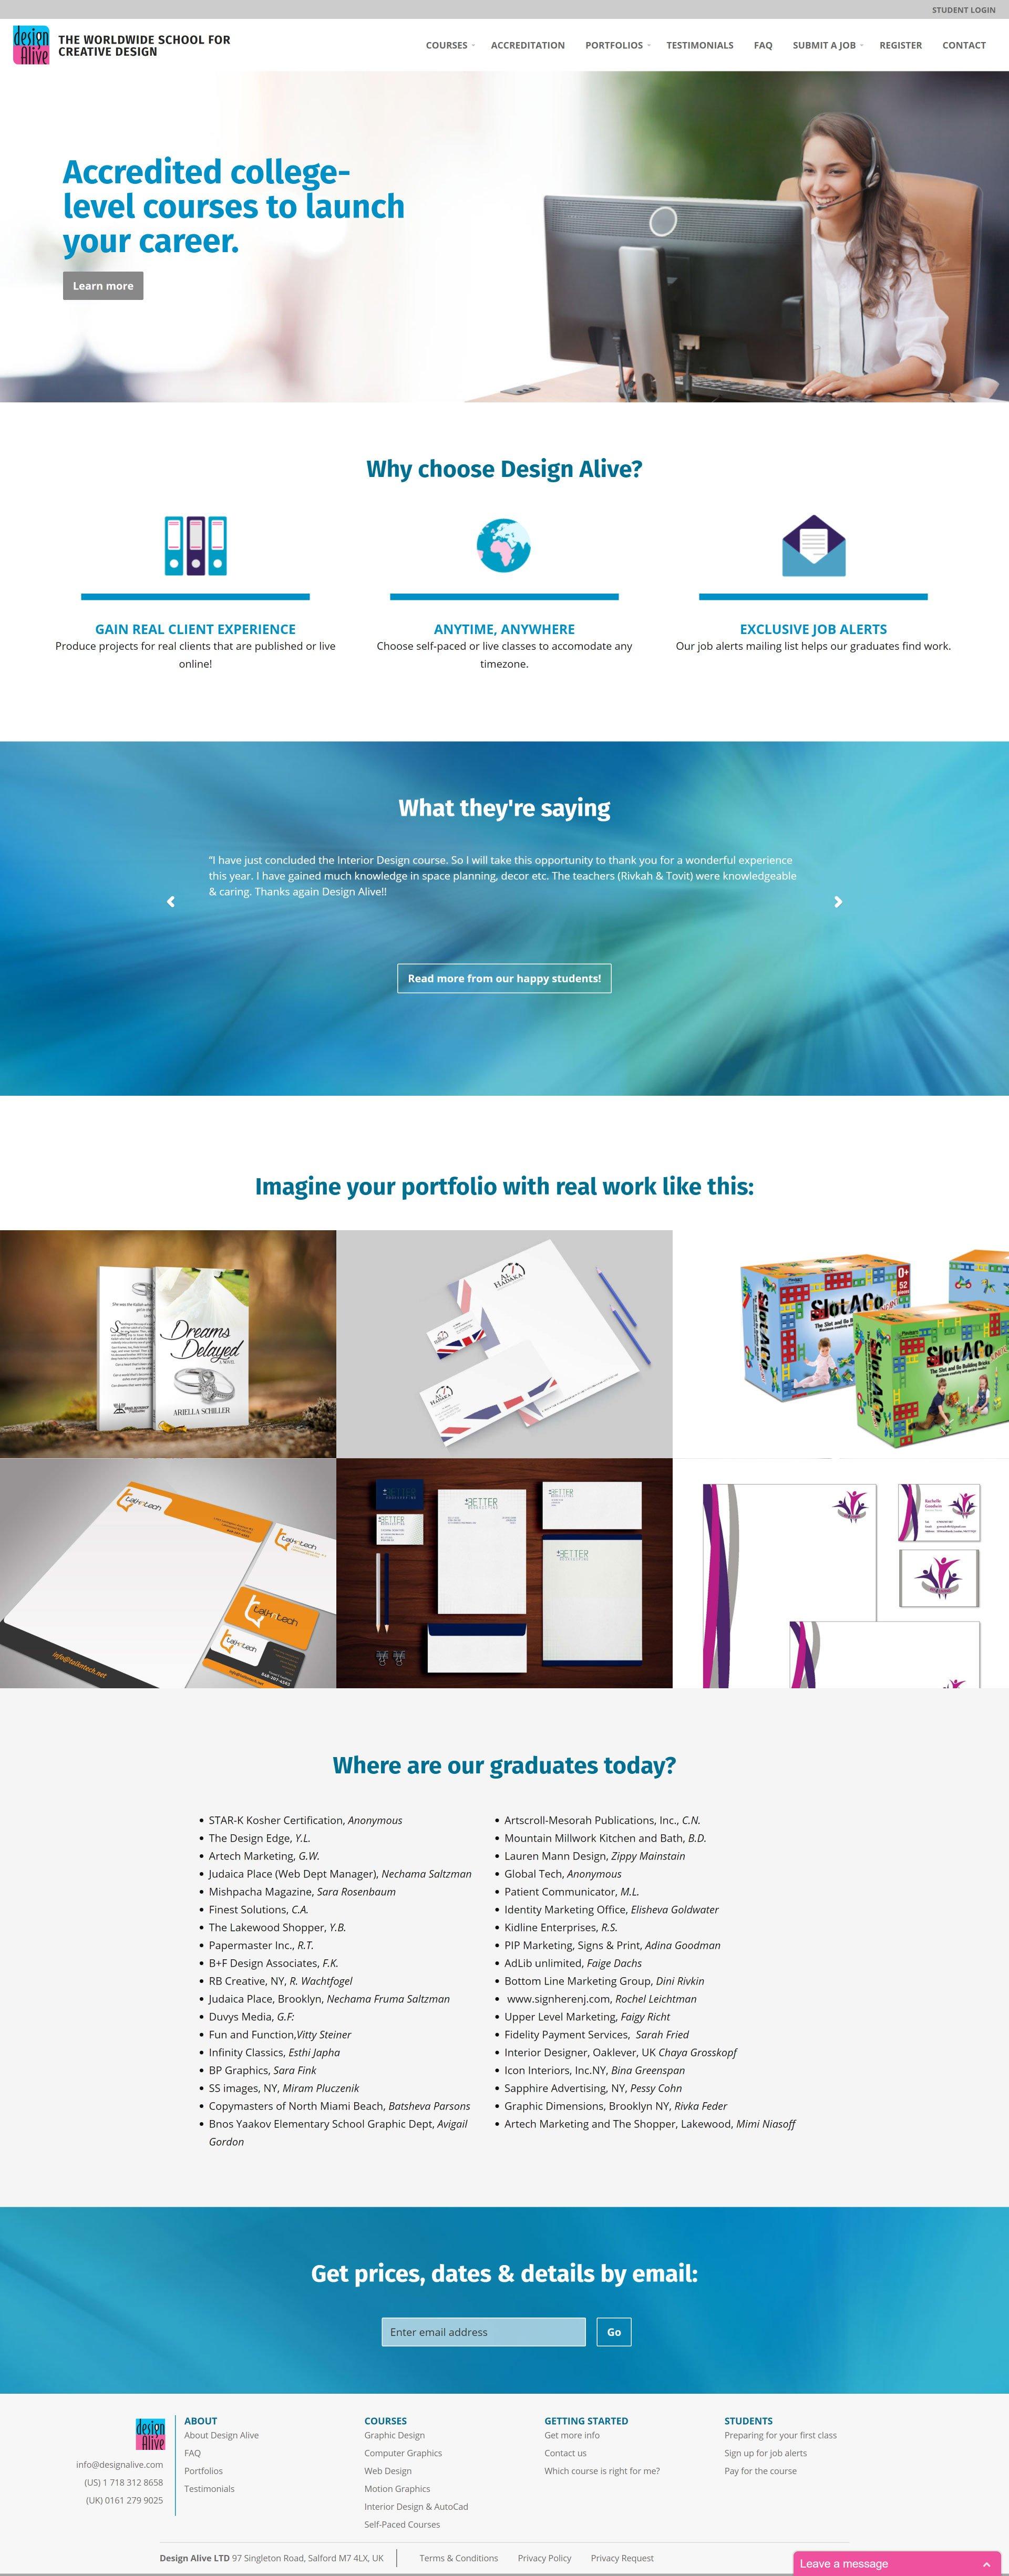 design alive home page